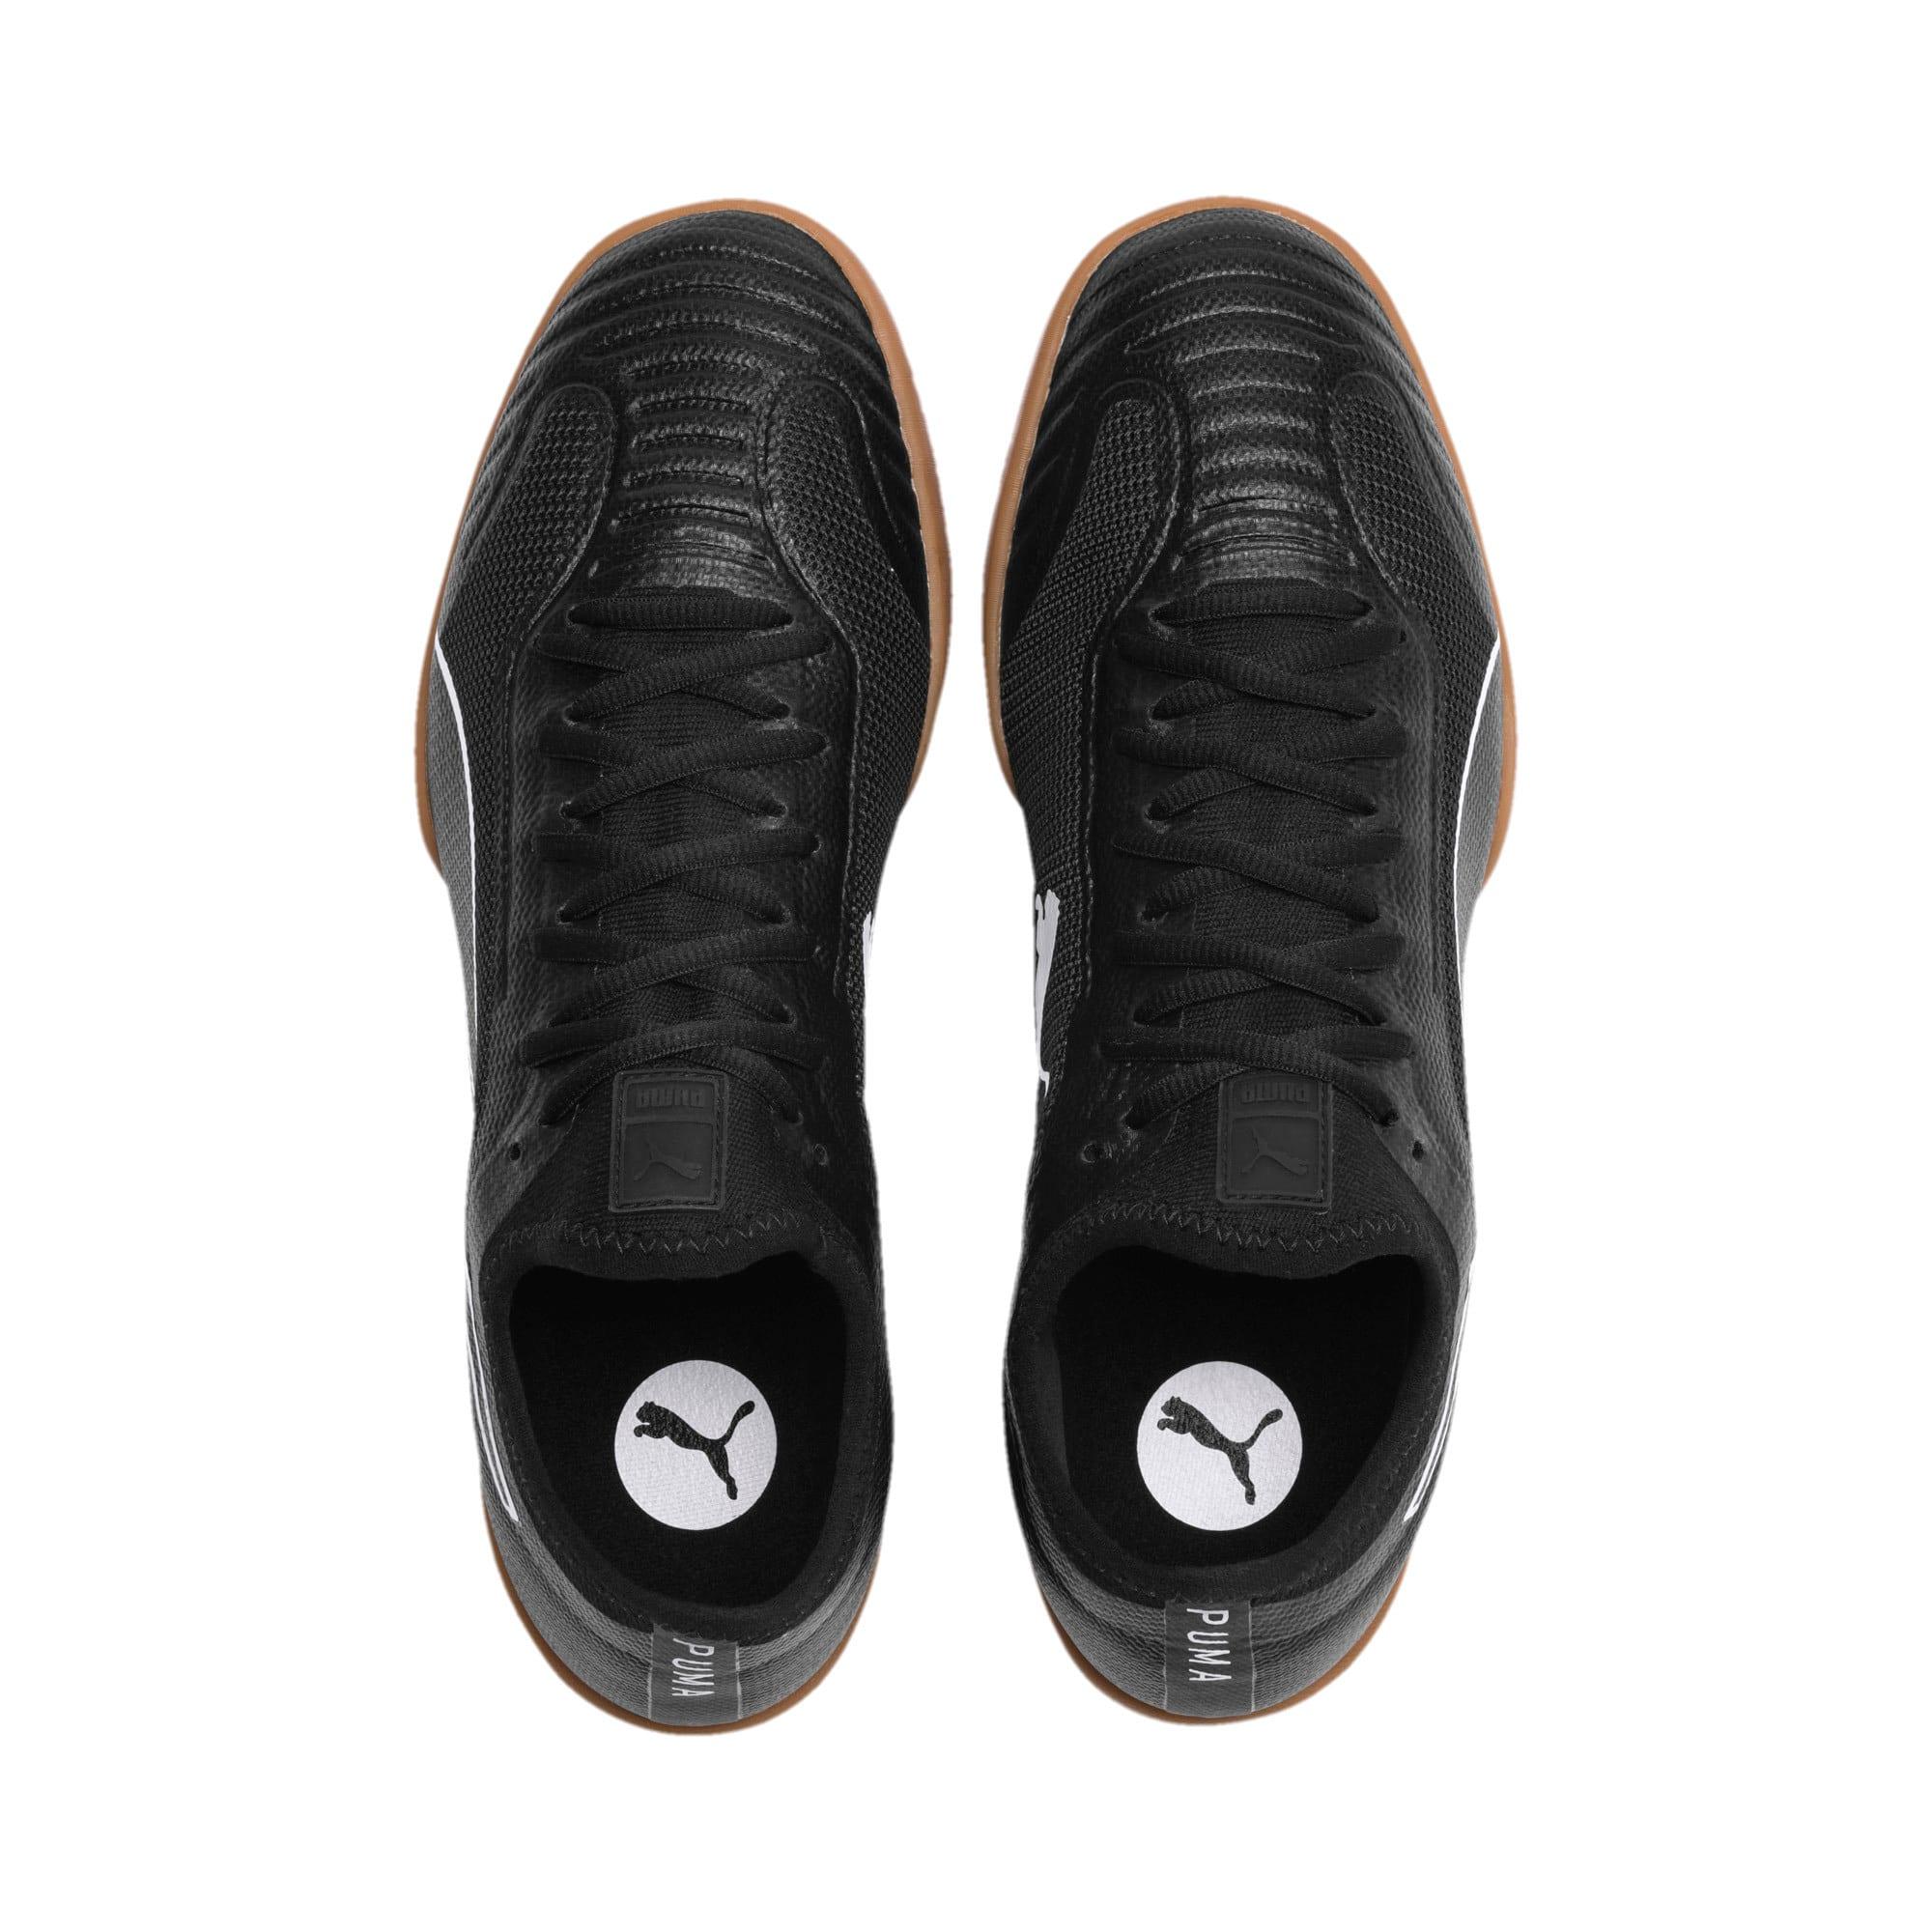 Thumbnail 7 of 365 Sala 1 Men's Football Boots, Puma Black-Puma White-Gum, medium